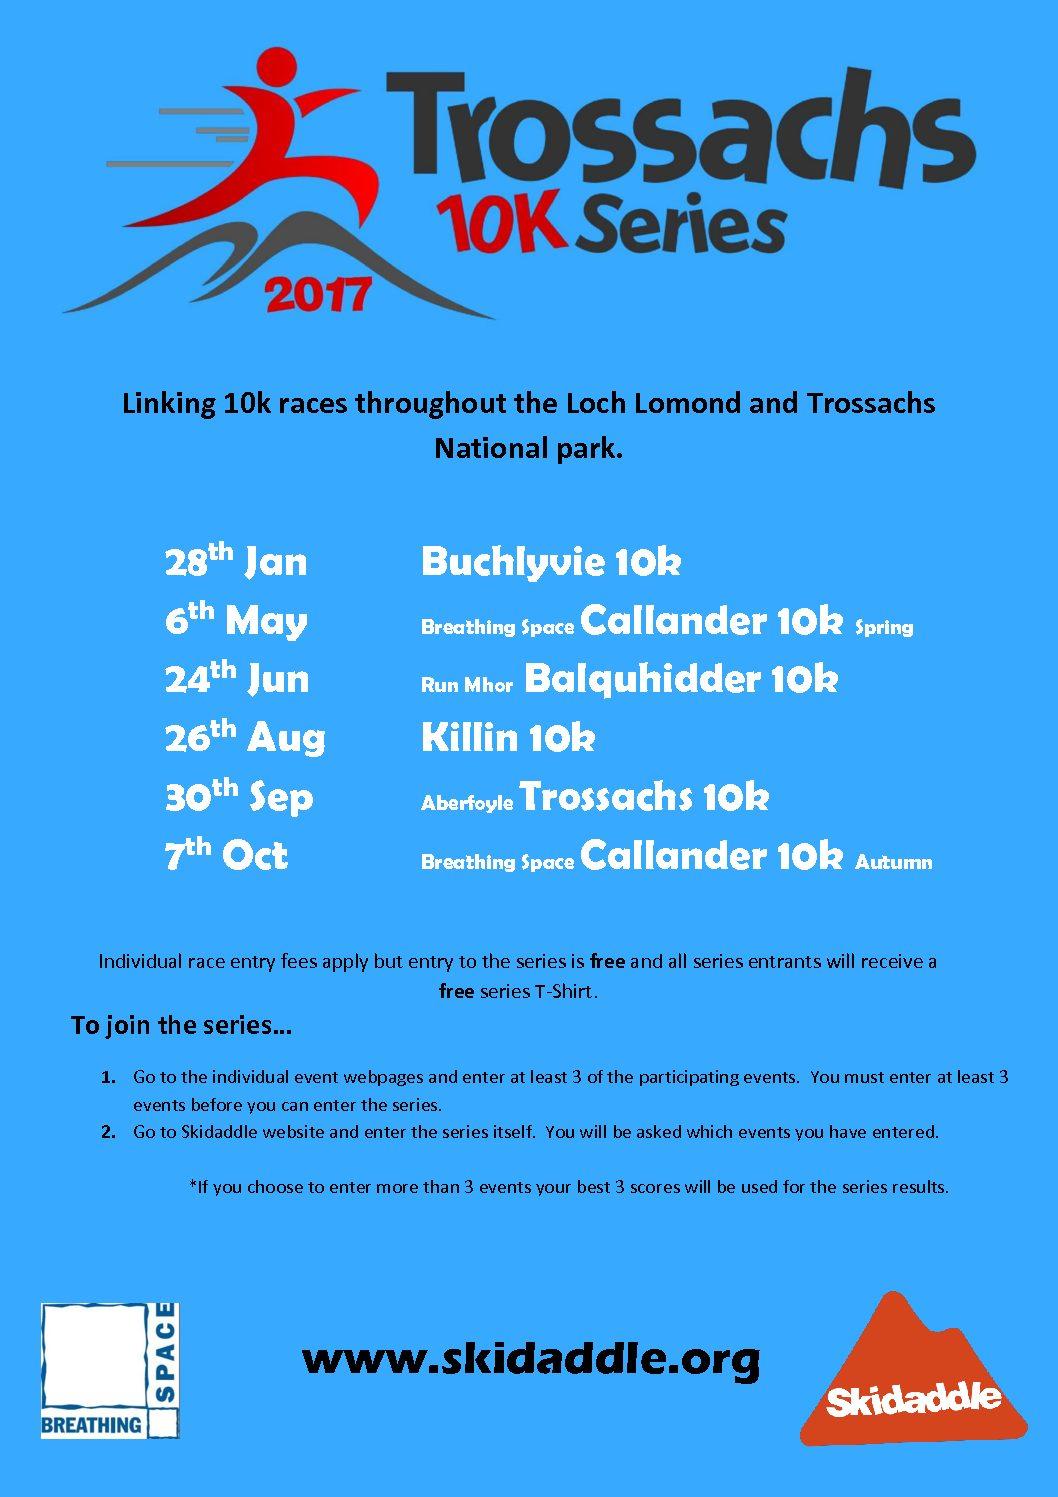 Trossachs-10k-Series-Leaflet-Design-2017